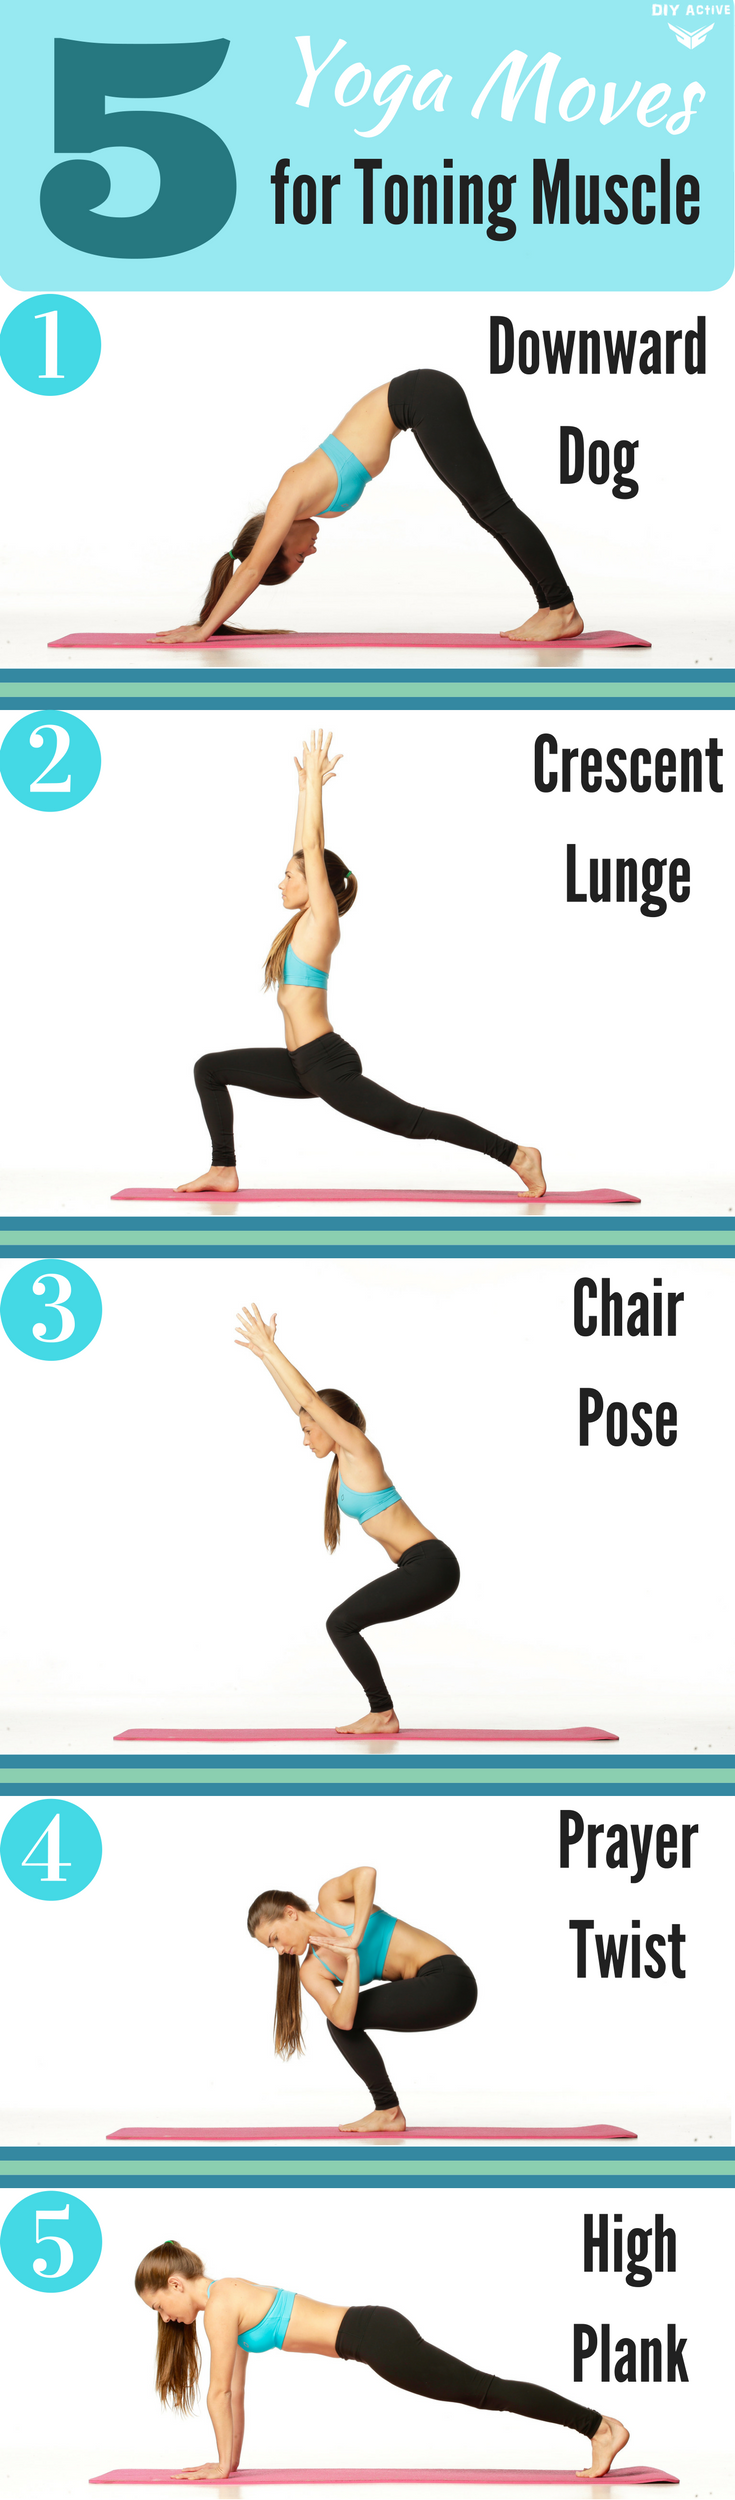 5 Yoga Moves for Toning Muscles via @DIYActiveHQ #yoga #exercise #workout